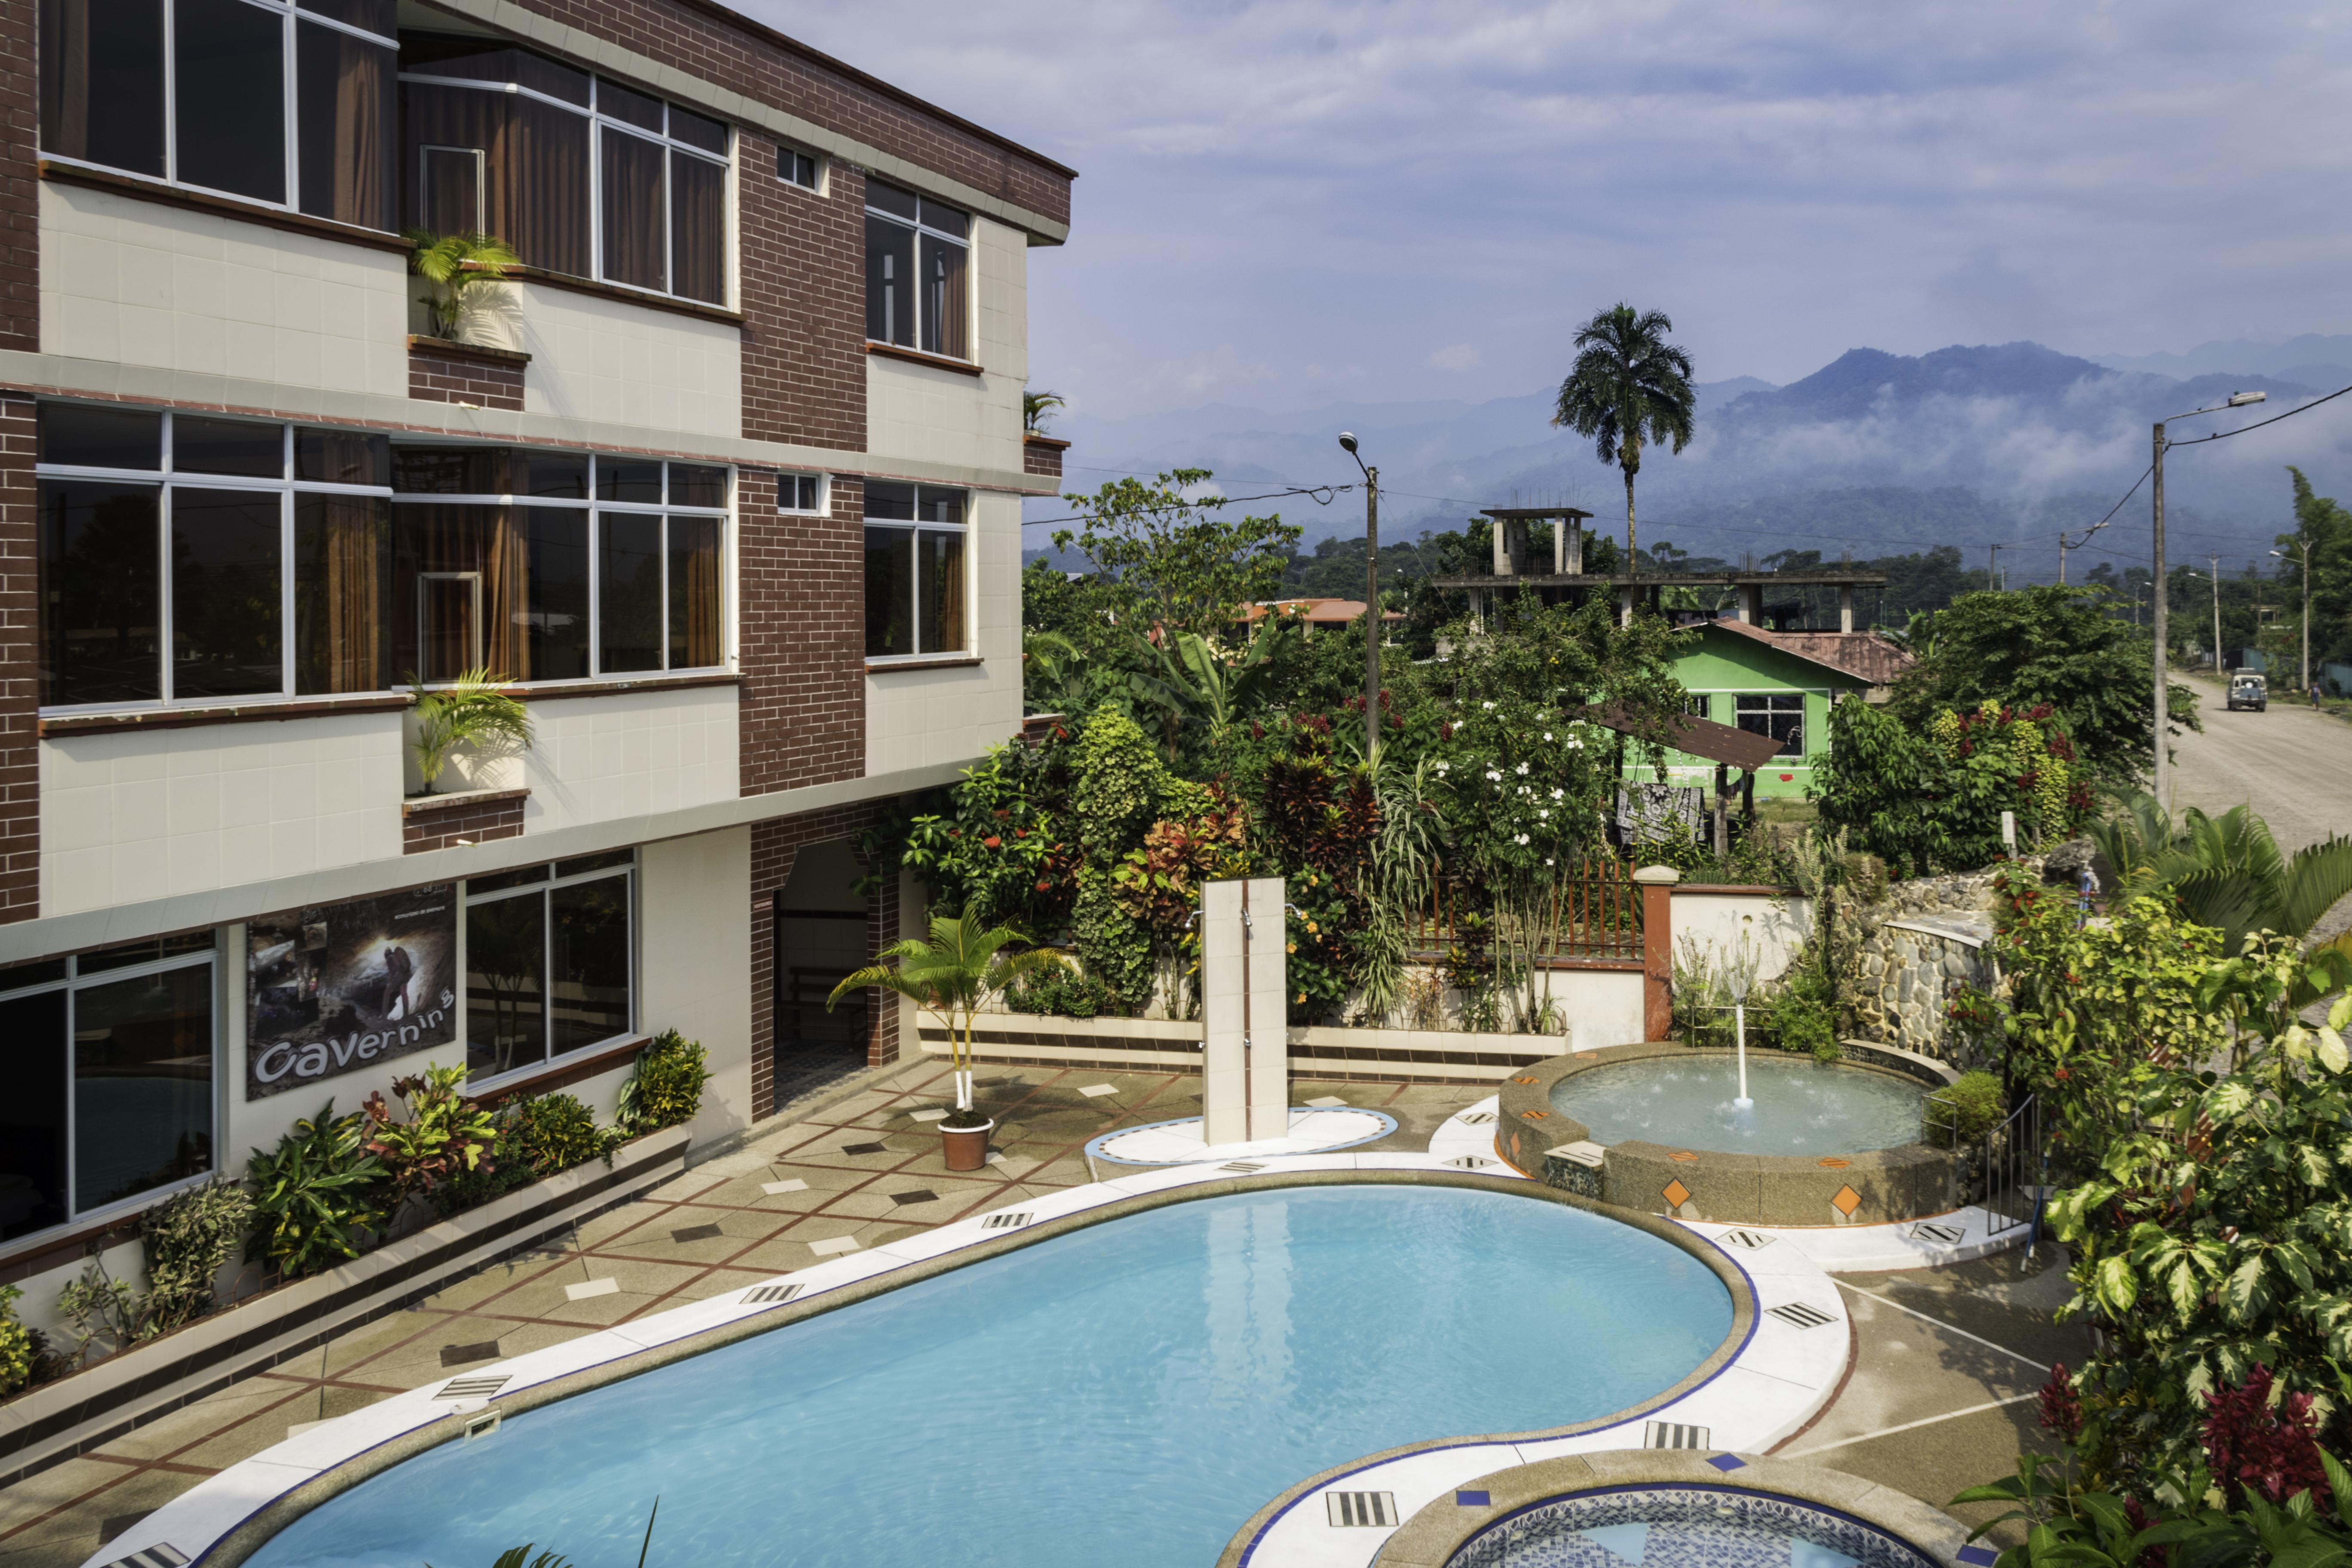 hotel con piscina al aire libre